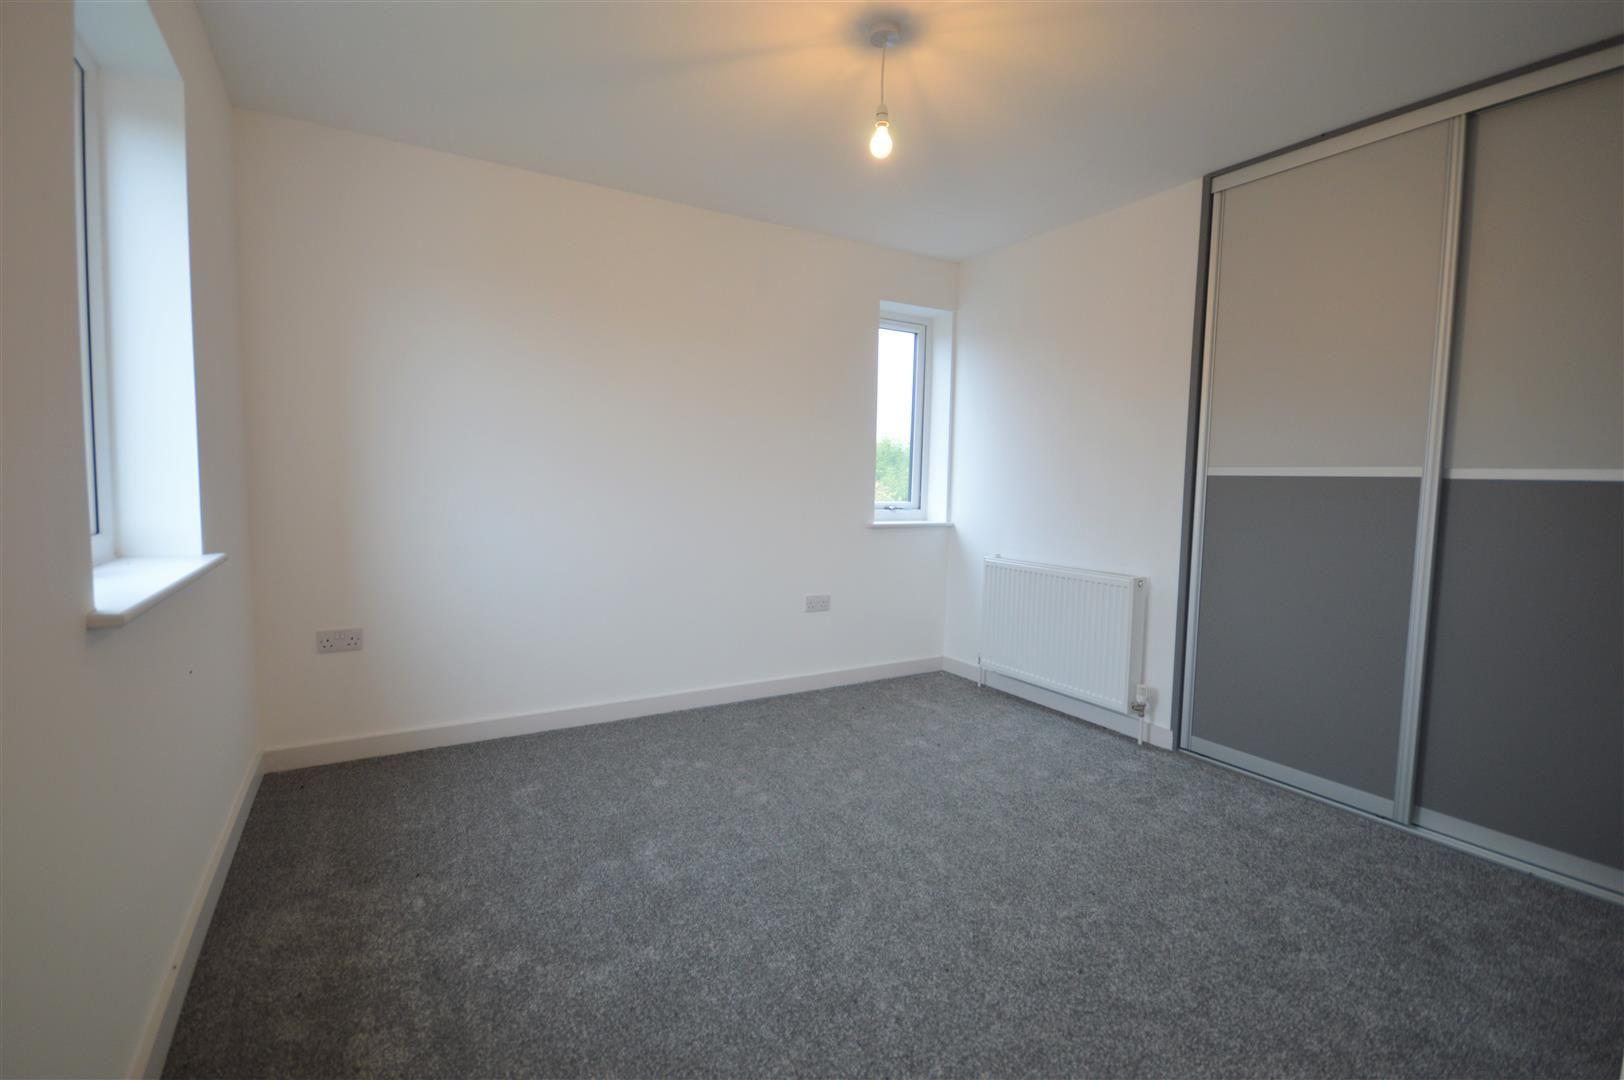 2 bed detached for sale in Leominster 8